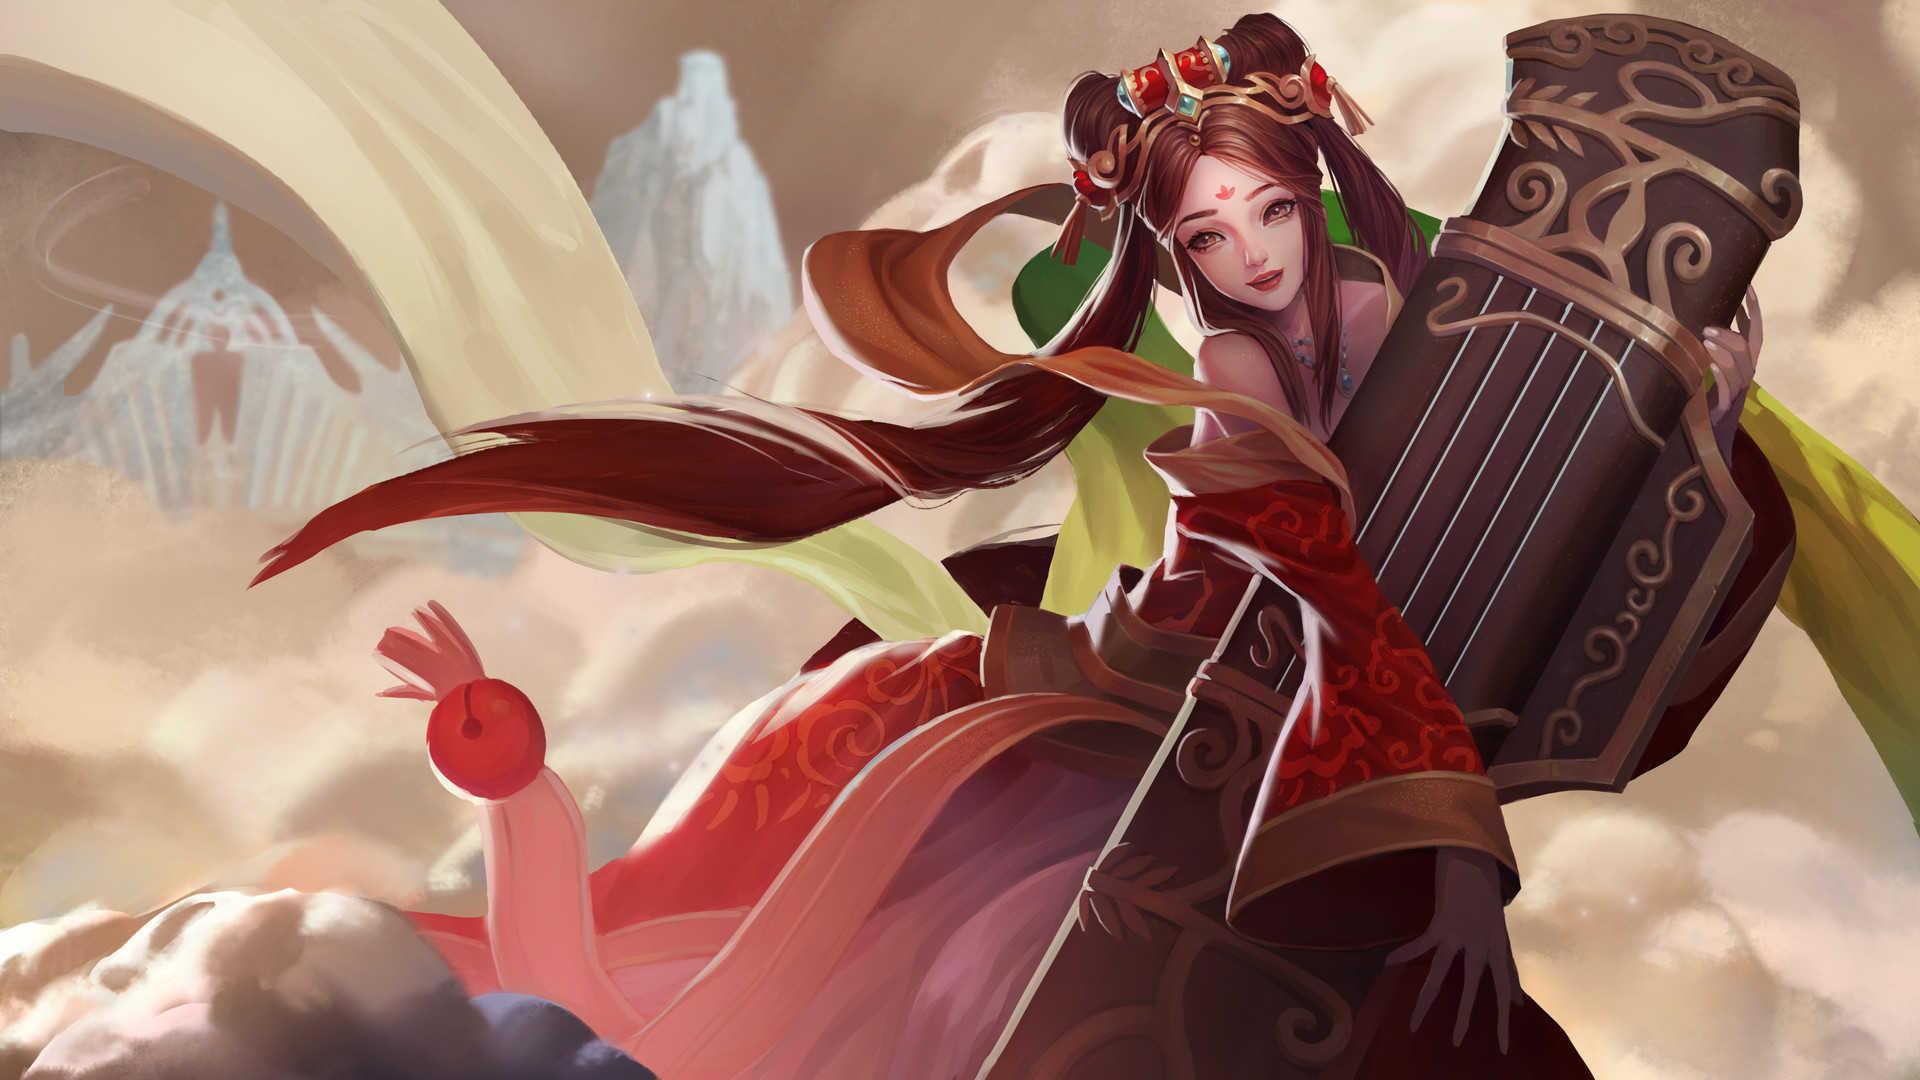 Sona League Of Legends Wallpaper Hd